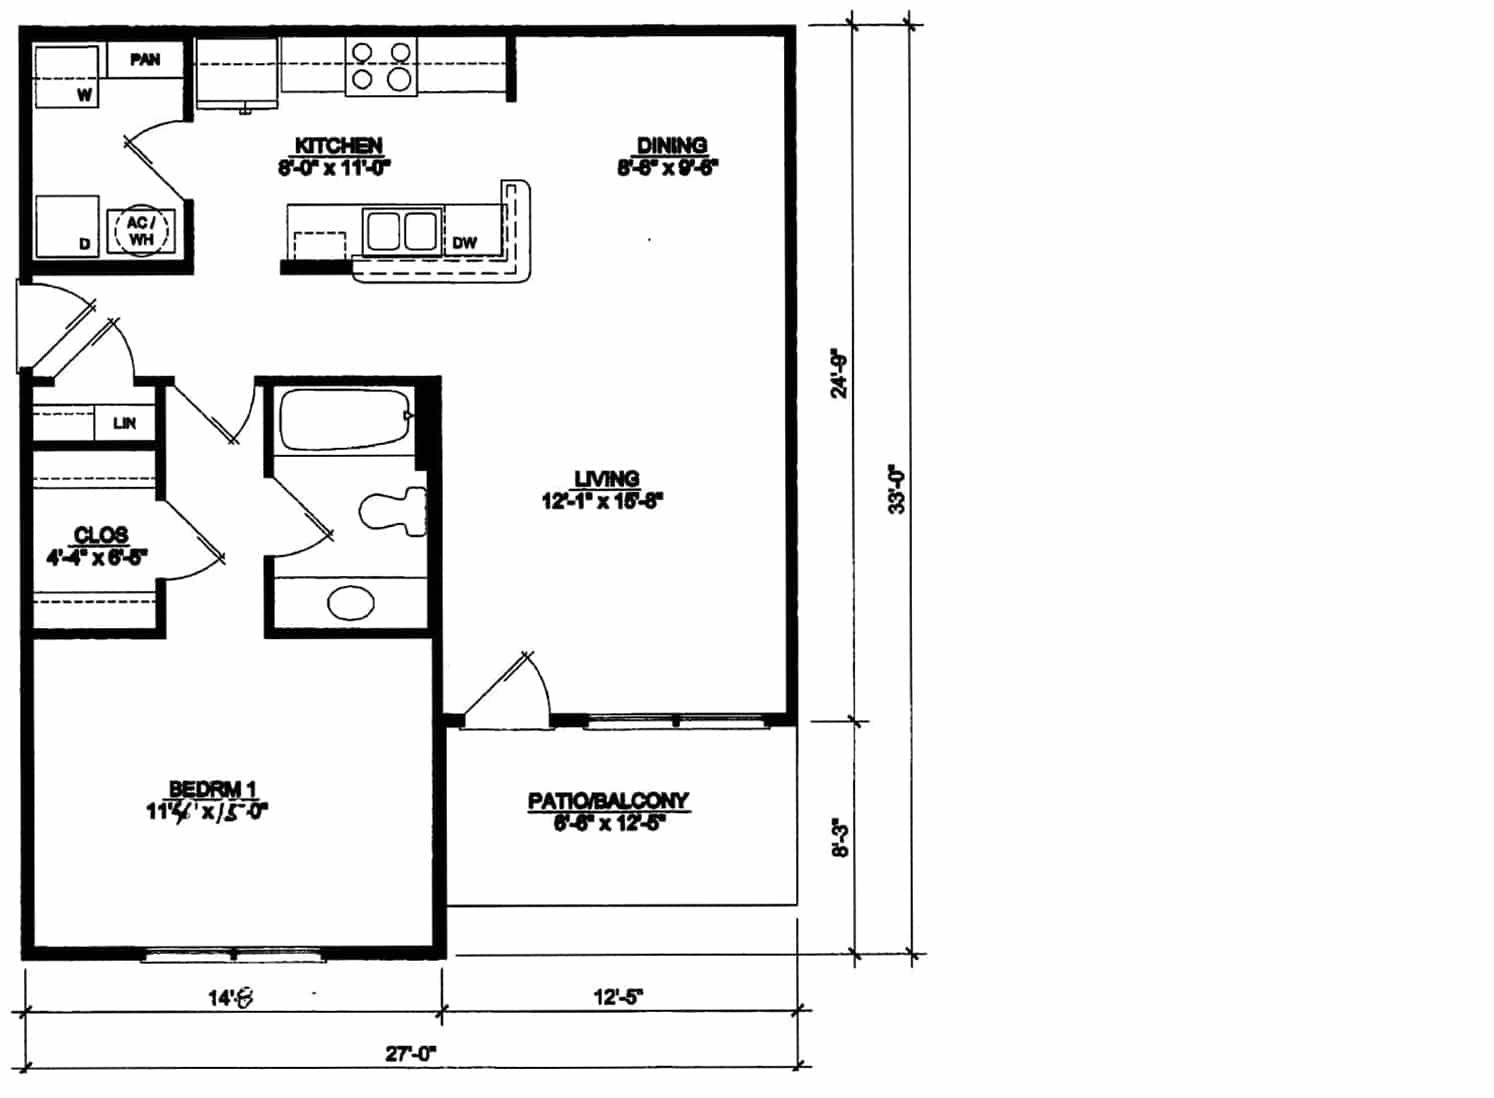 apartments | 1 bedroom apartment paducah | 1 bedroom apartment